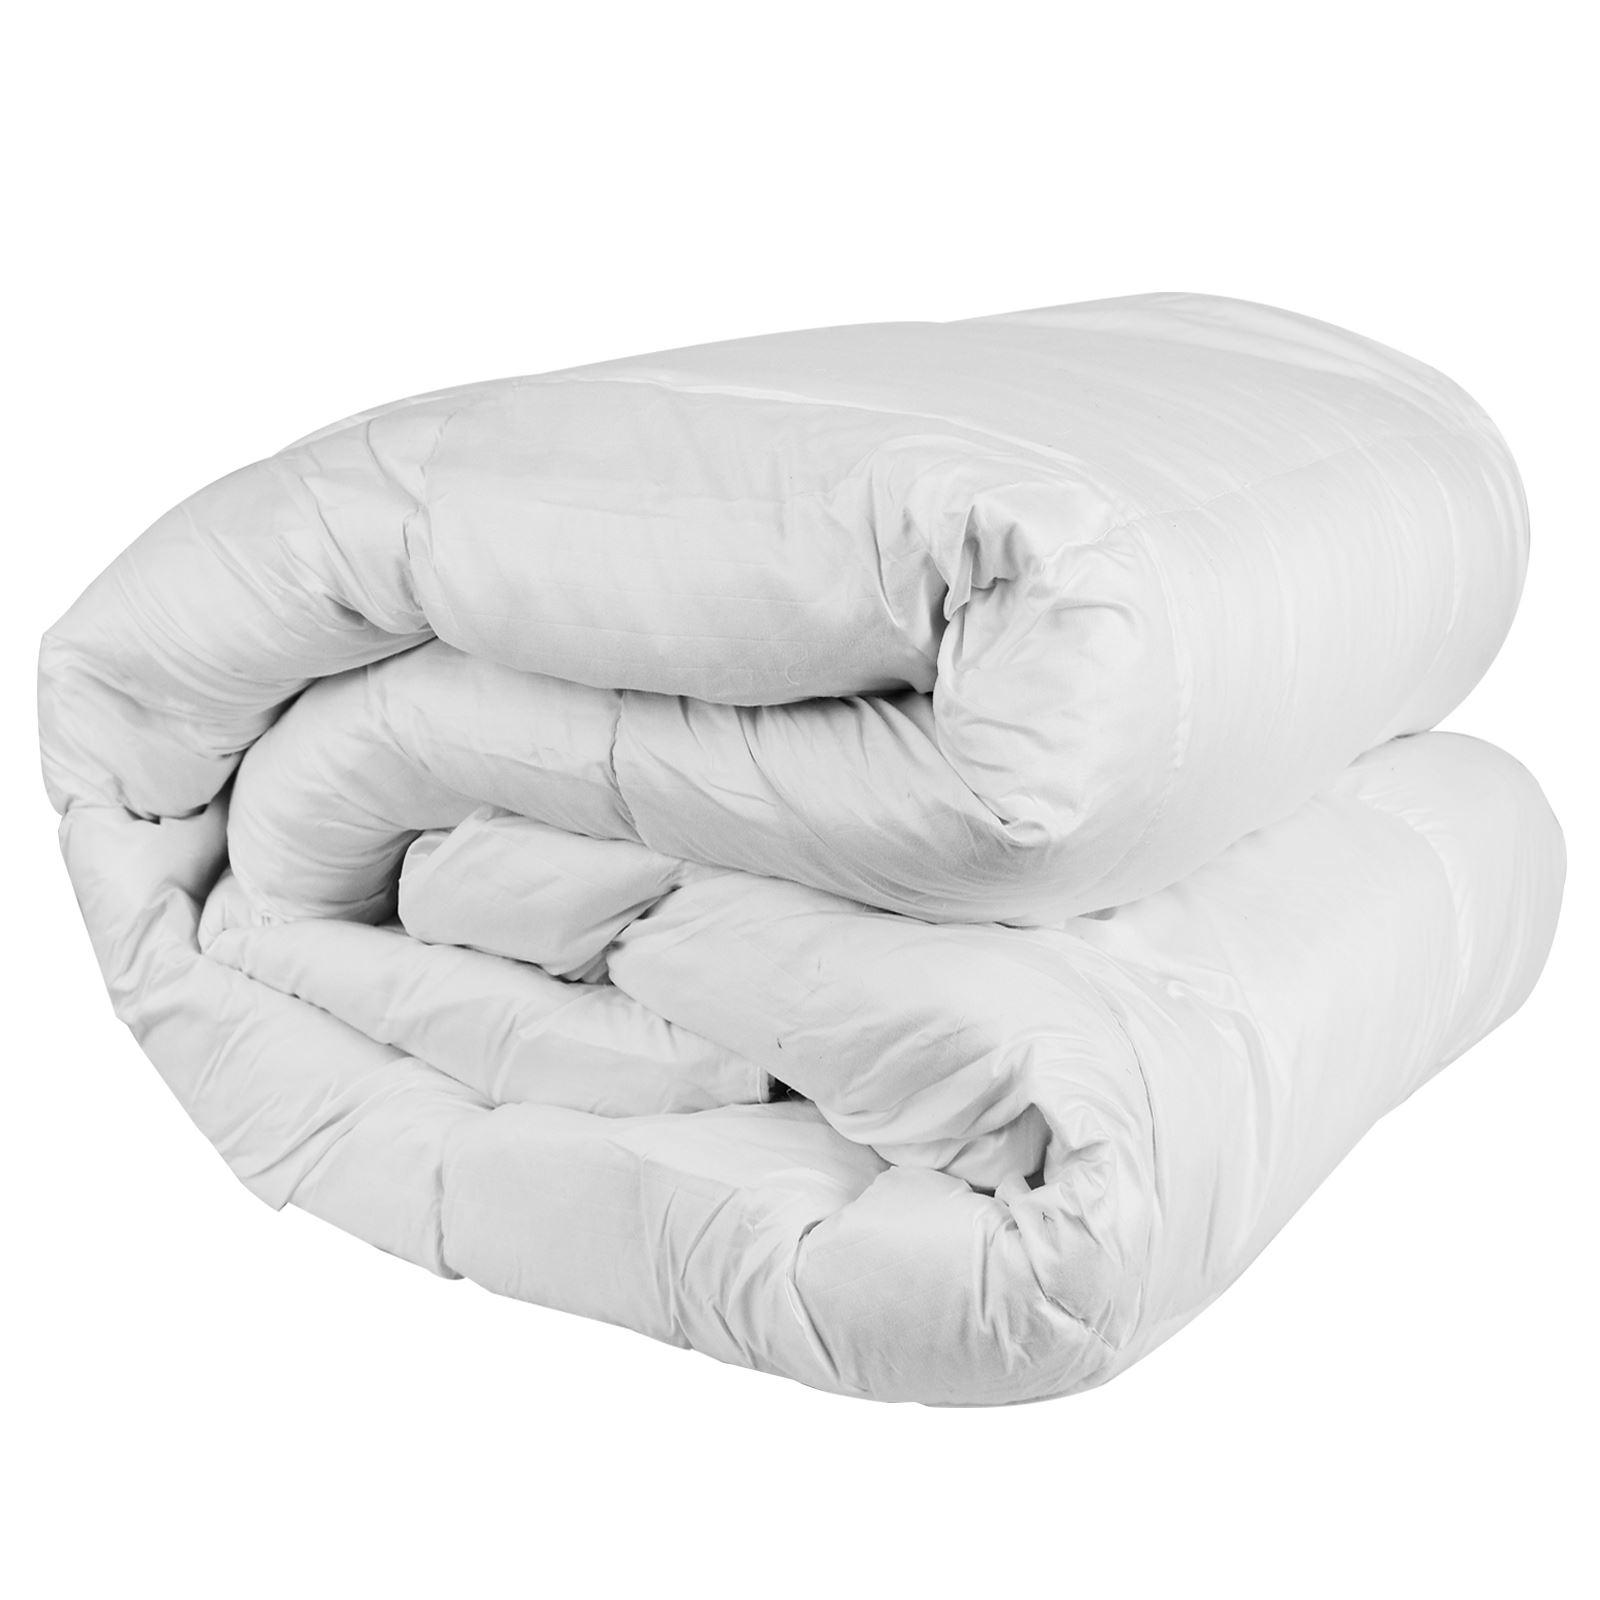 Lujo-Pluma-De-Pato-Abajo-Edredon-Ropa-De-Cama-Edredon-relleno-confortable-13-5-15-Tog miniatura 11